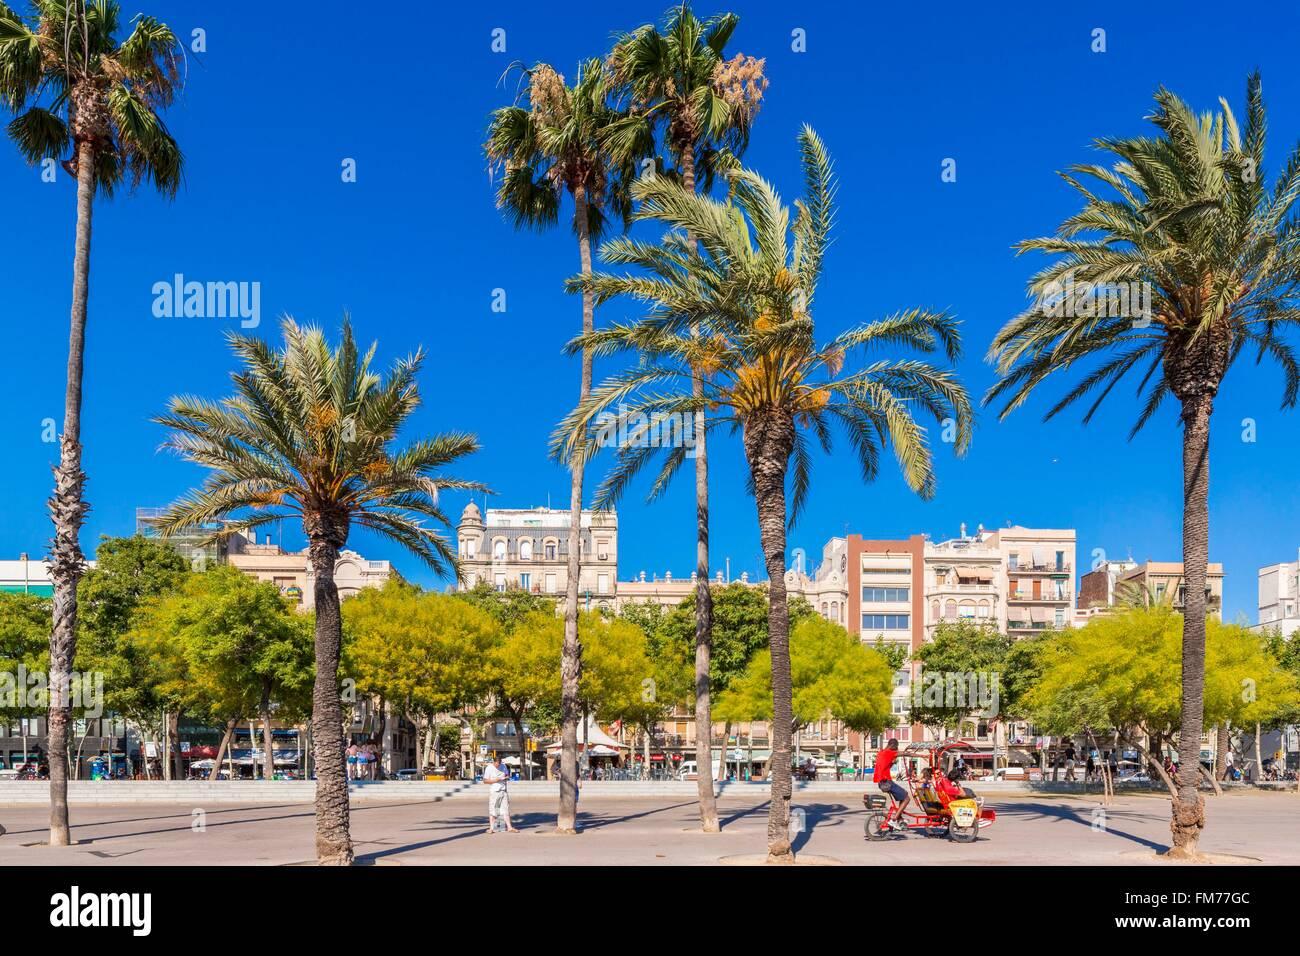 Spain, Catalonia, Barcelona, La Barceloneta, Passeig Joan de Borbo seen from the Port Vell - Stock Image